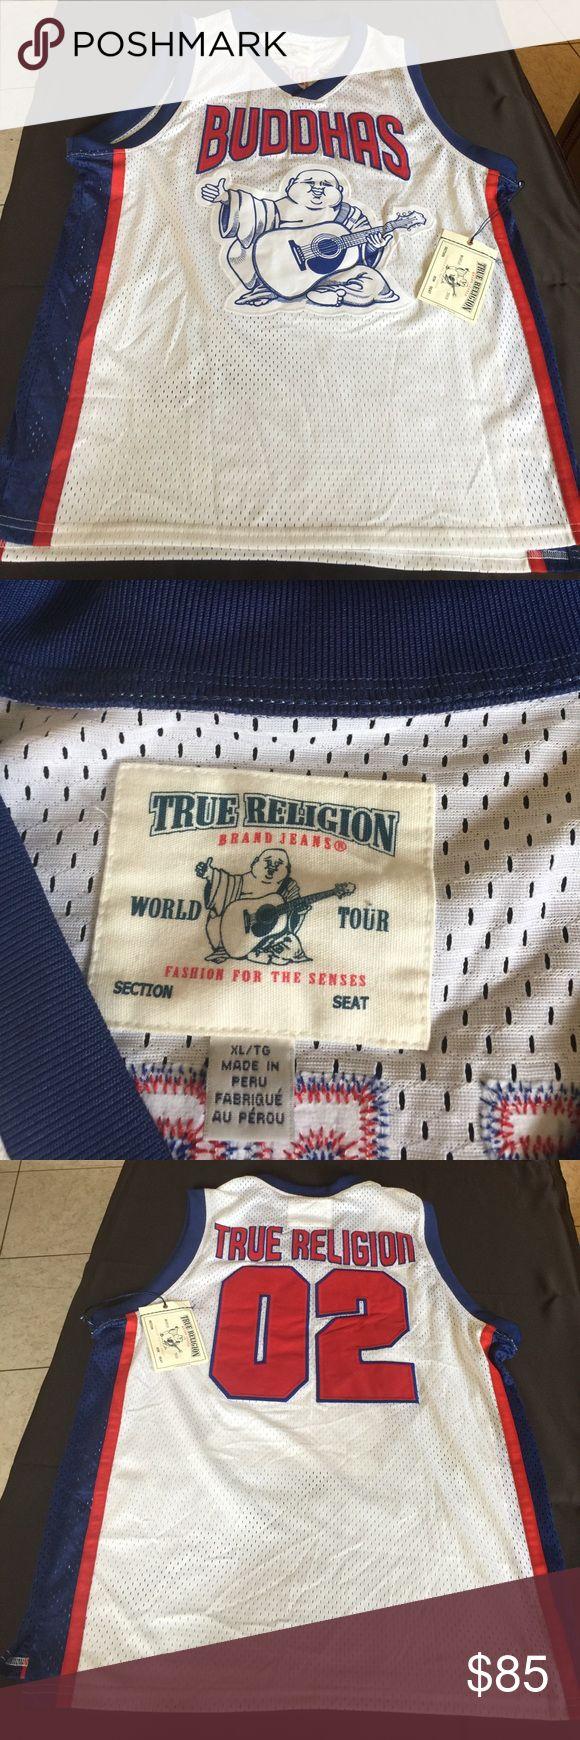 TRUE RELIGION ORIGINAL Size XL New Size XL Reasonable offers welcome True Religion Shirts